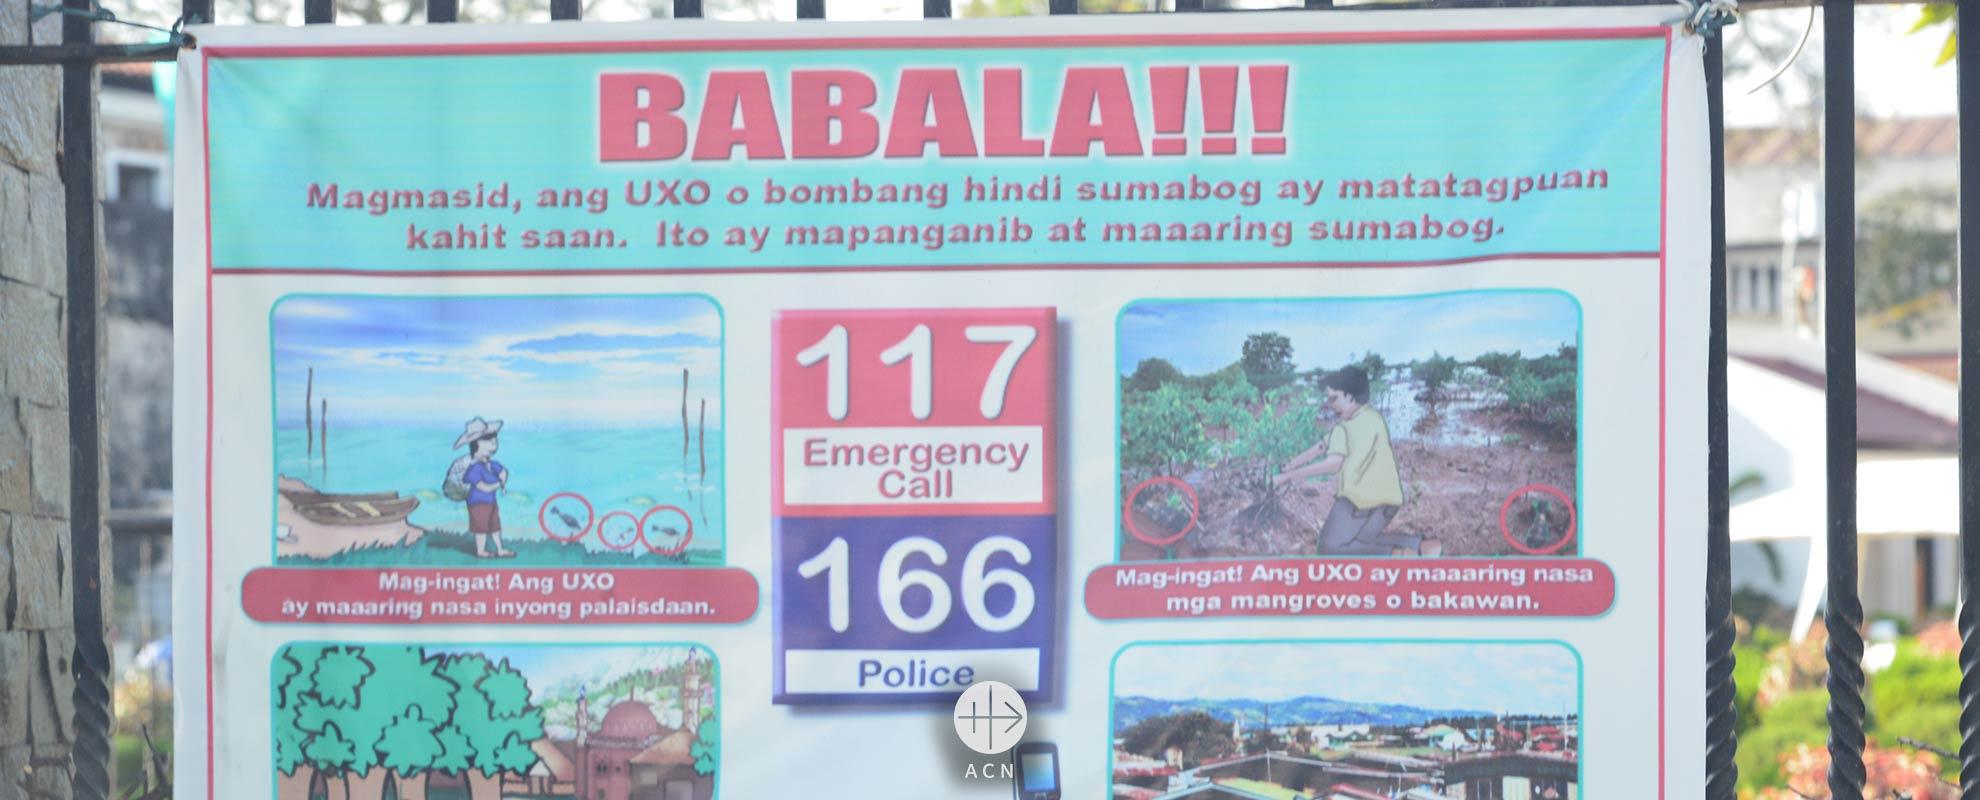 Filipino Church calls for prayer and solidarity following bomb attack